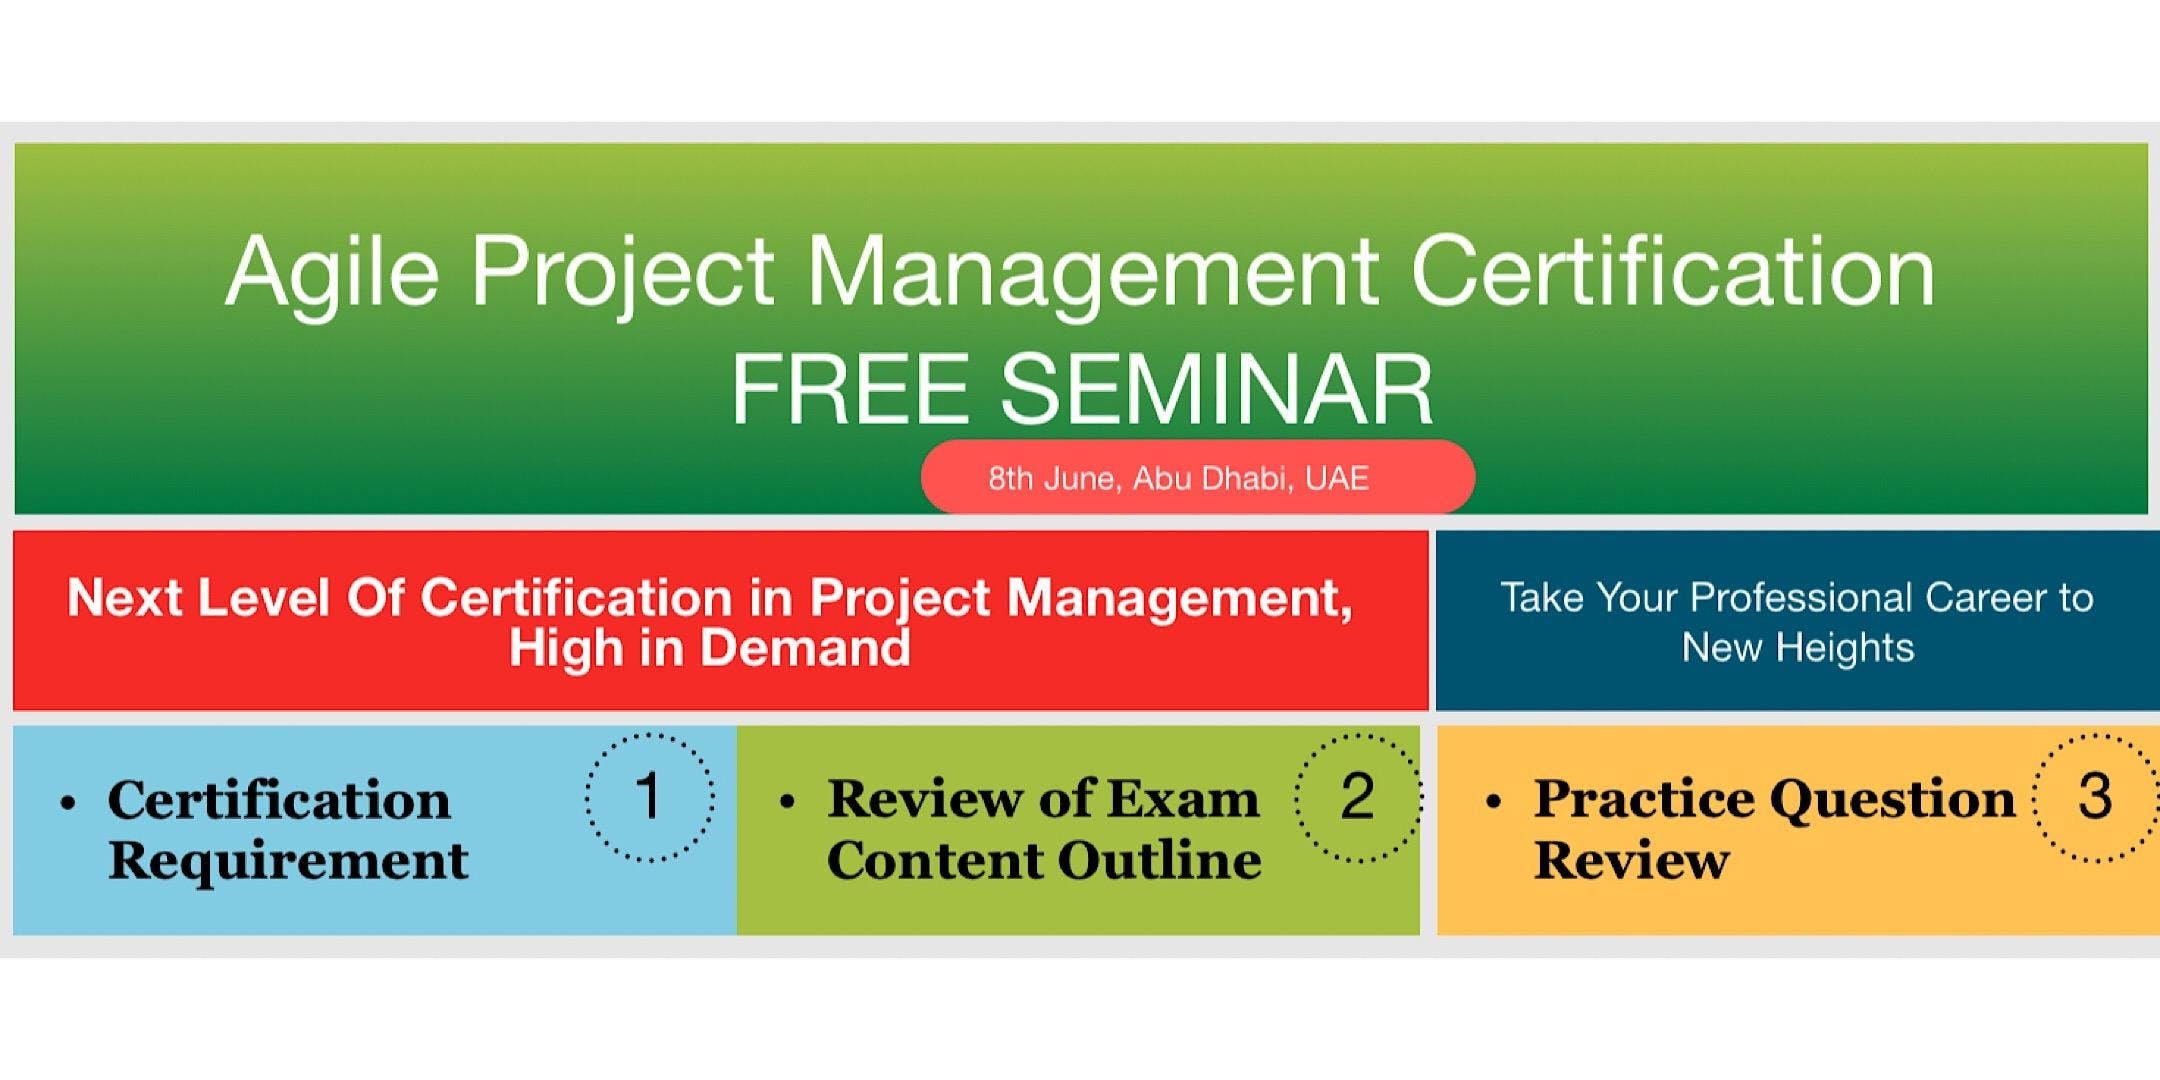 Agile Project Management Certification Seminar 8 Jun 2018